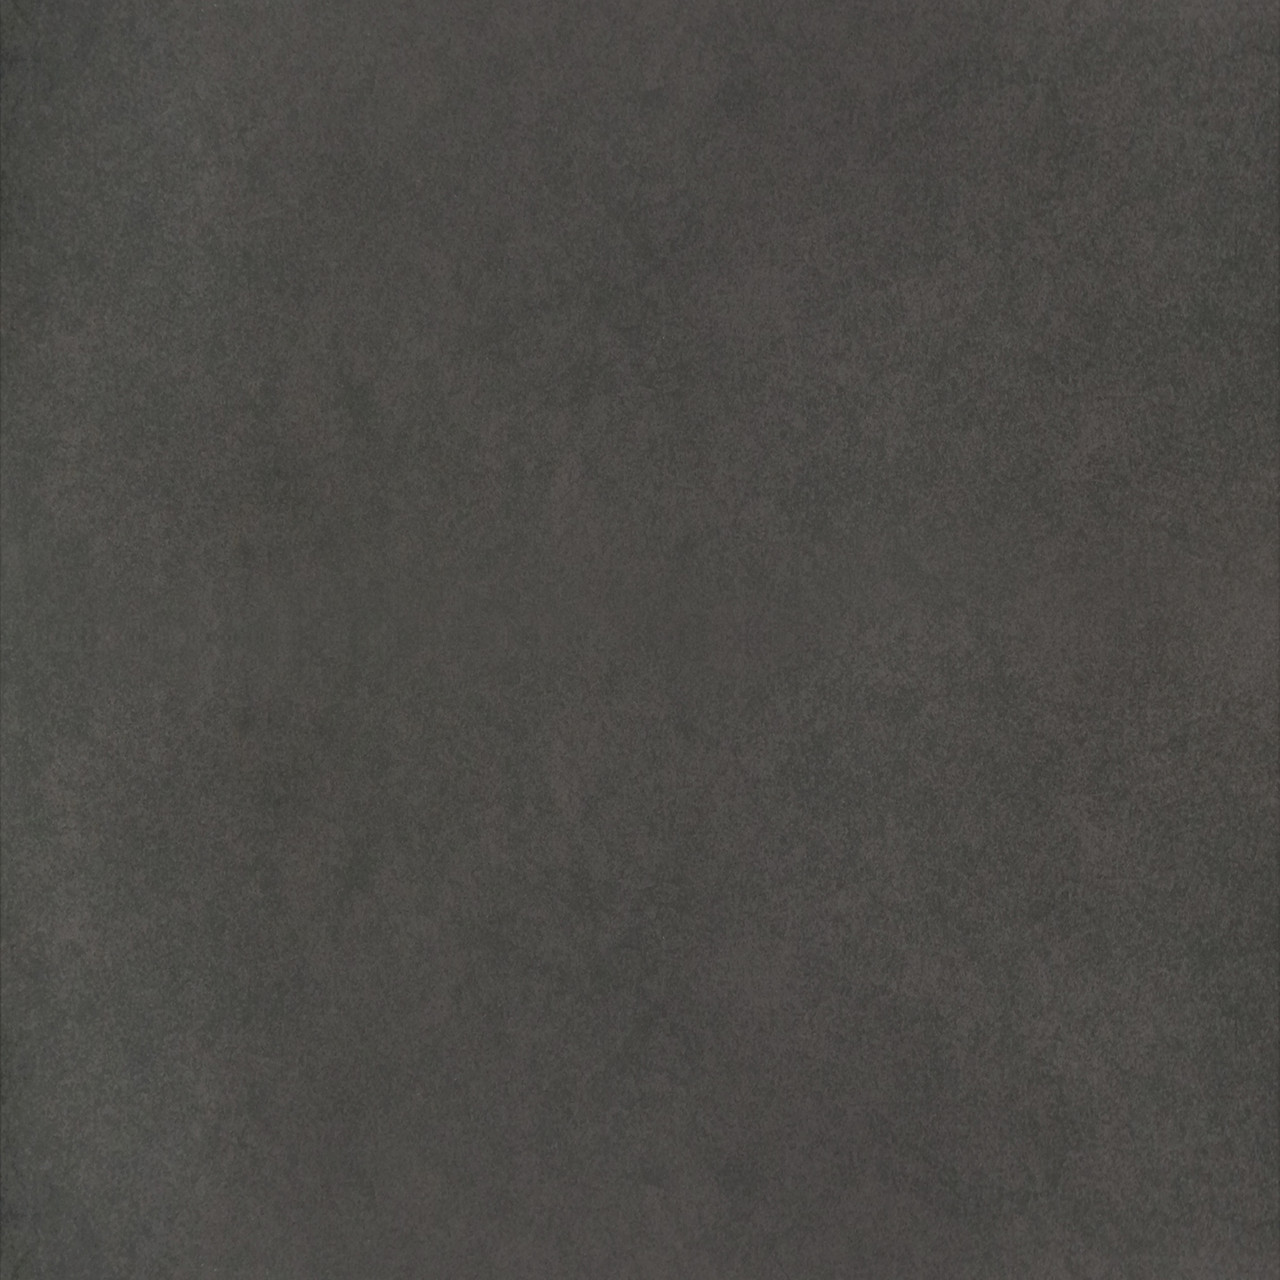 Плитка для пола Arc BK 600x600